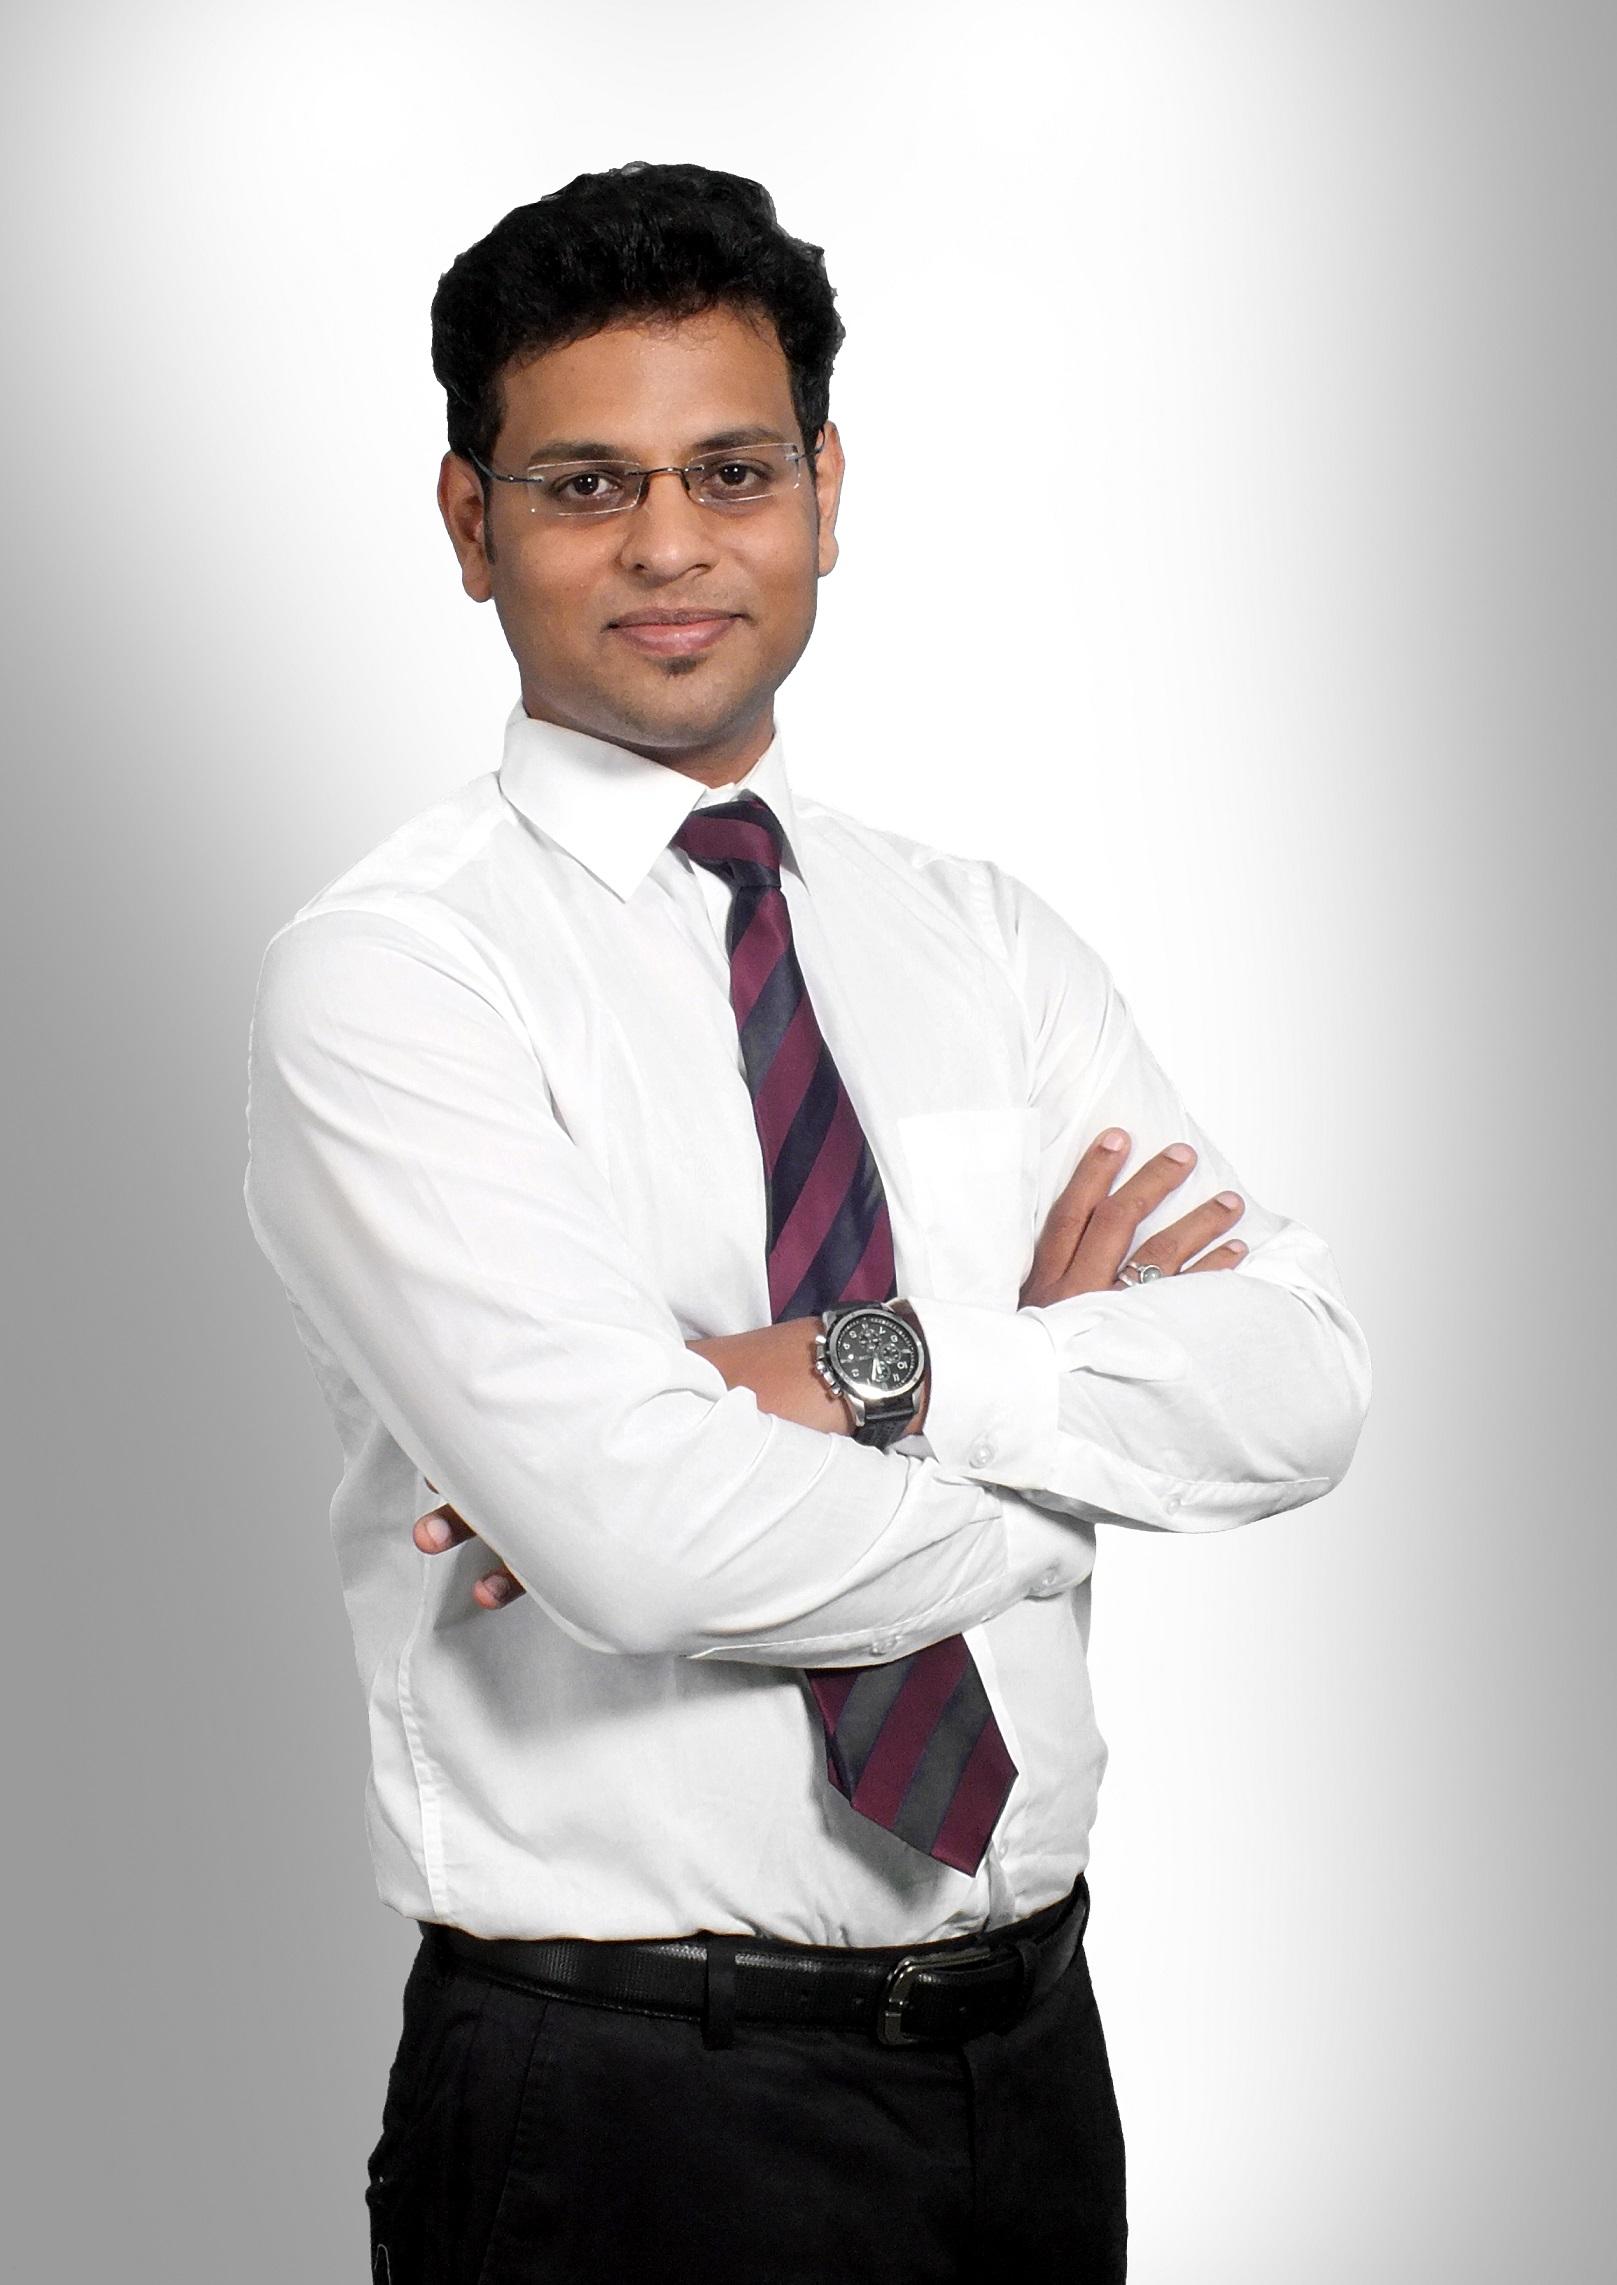 Dr. Srikant Parthasarathy